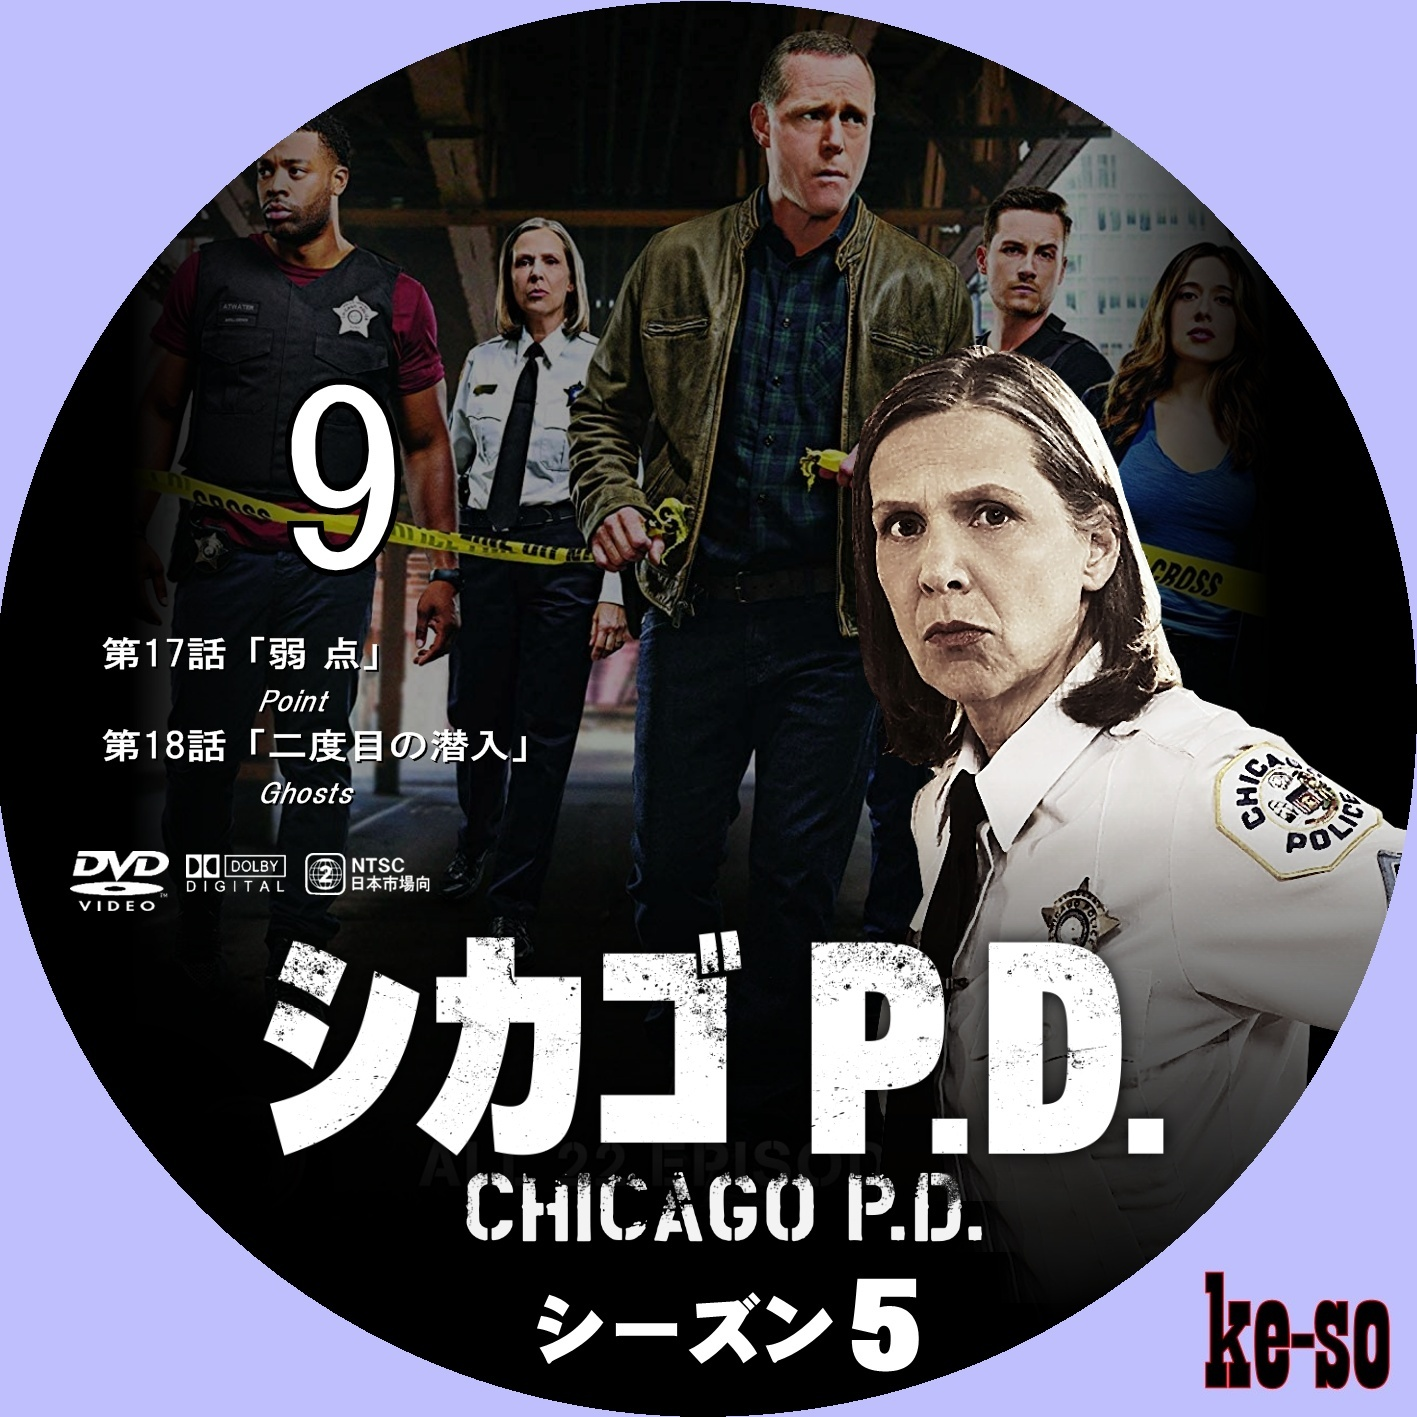 Pd シーズン 5 シカゴ